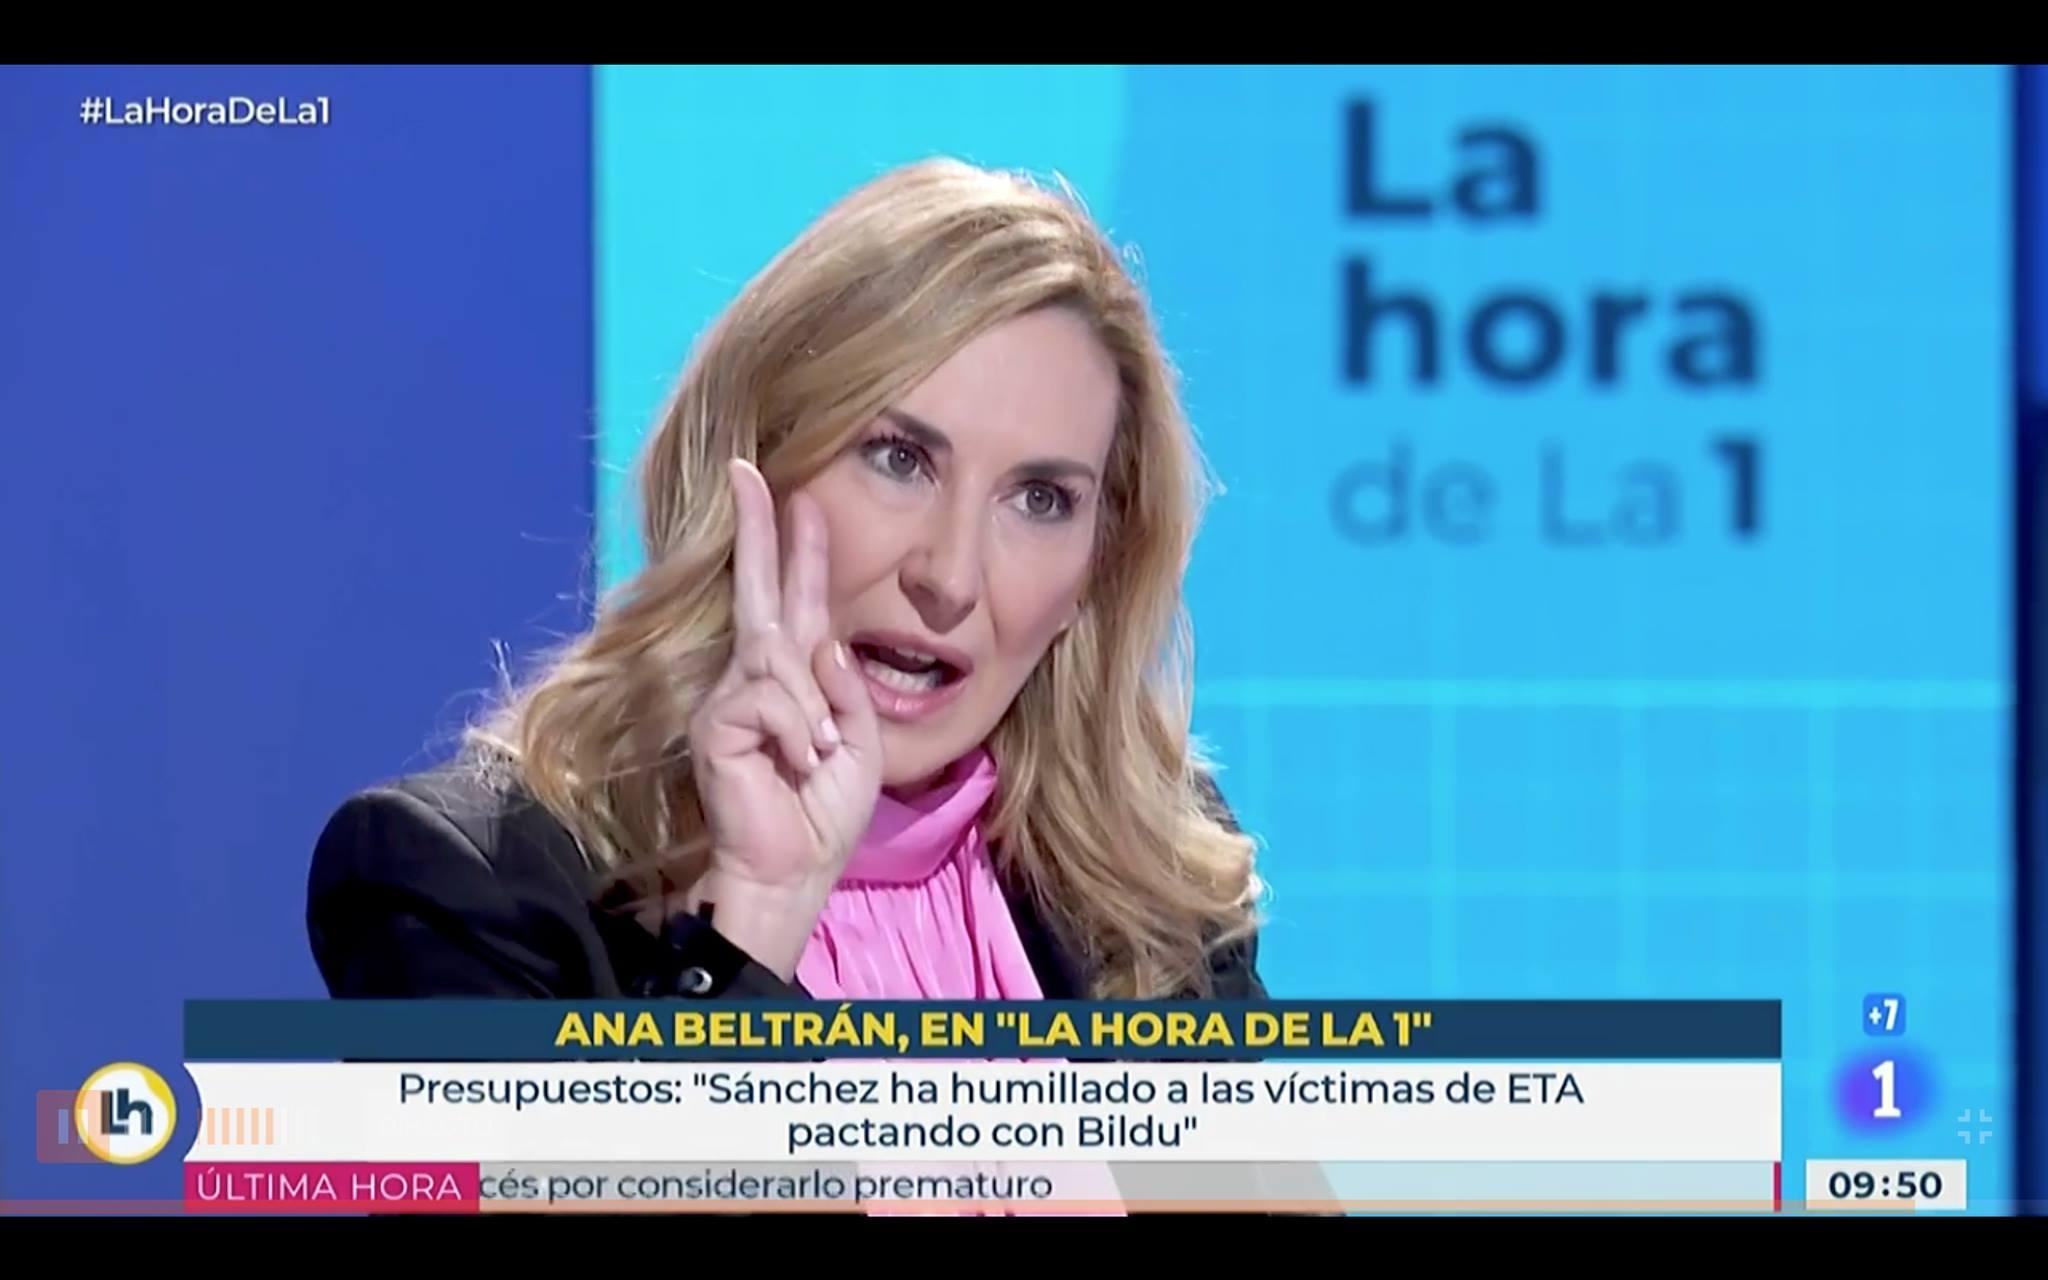 Ana Beltrán acusa a Bildu